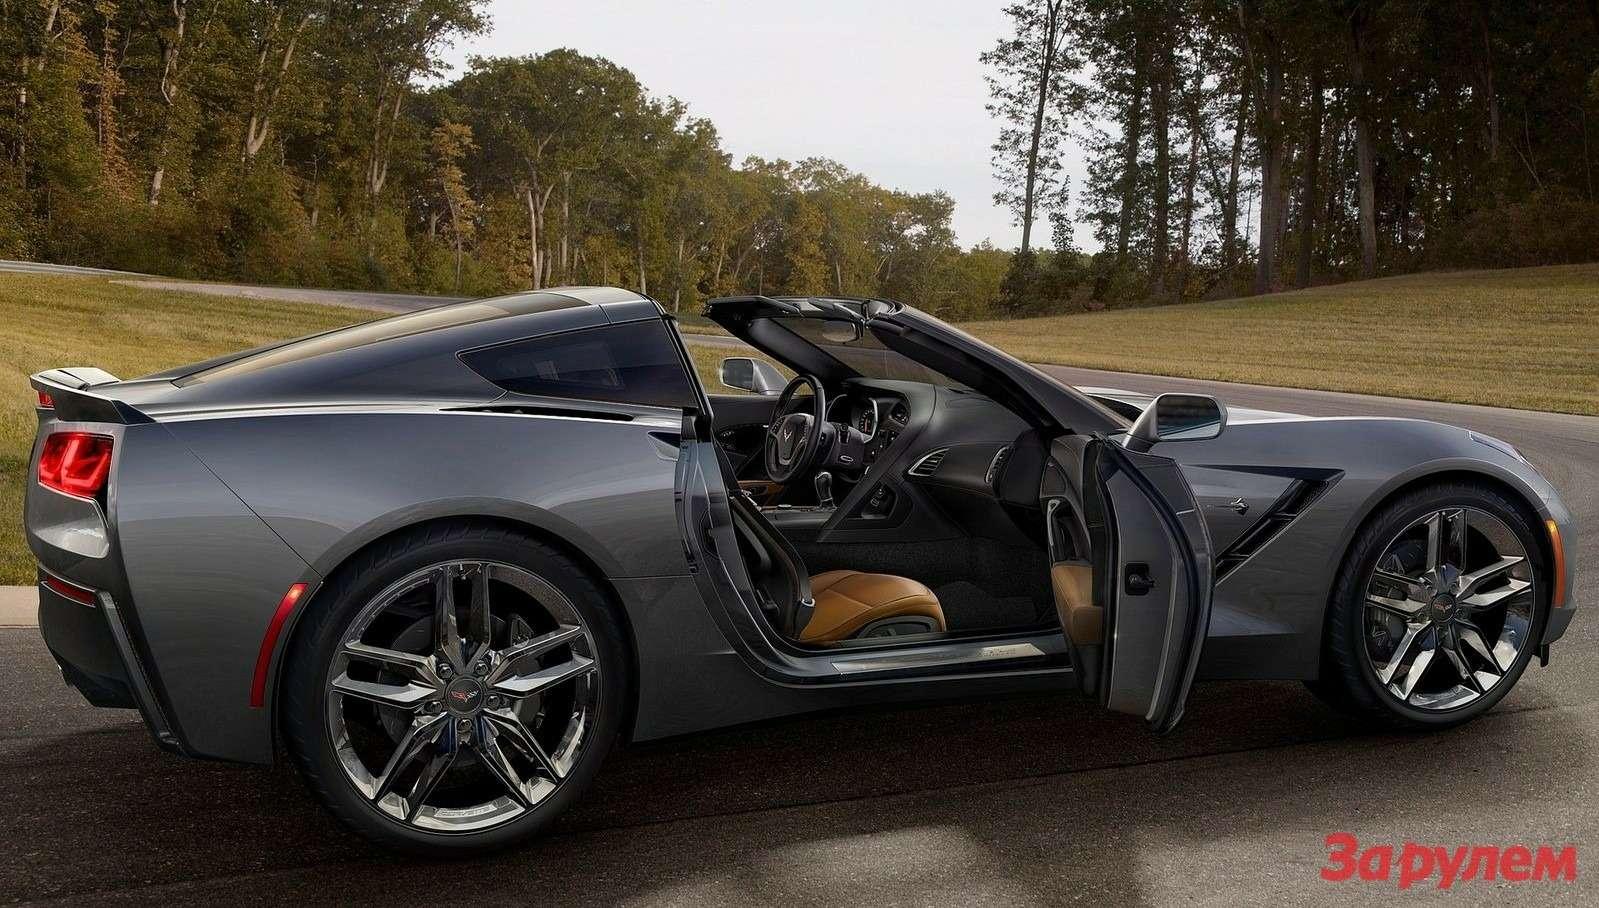 Chevrolet-Corvette_C7_Stingray_2014_1600x1200_wallpaper_13